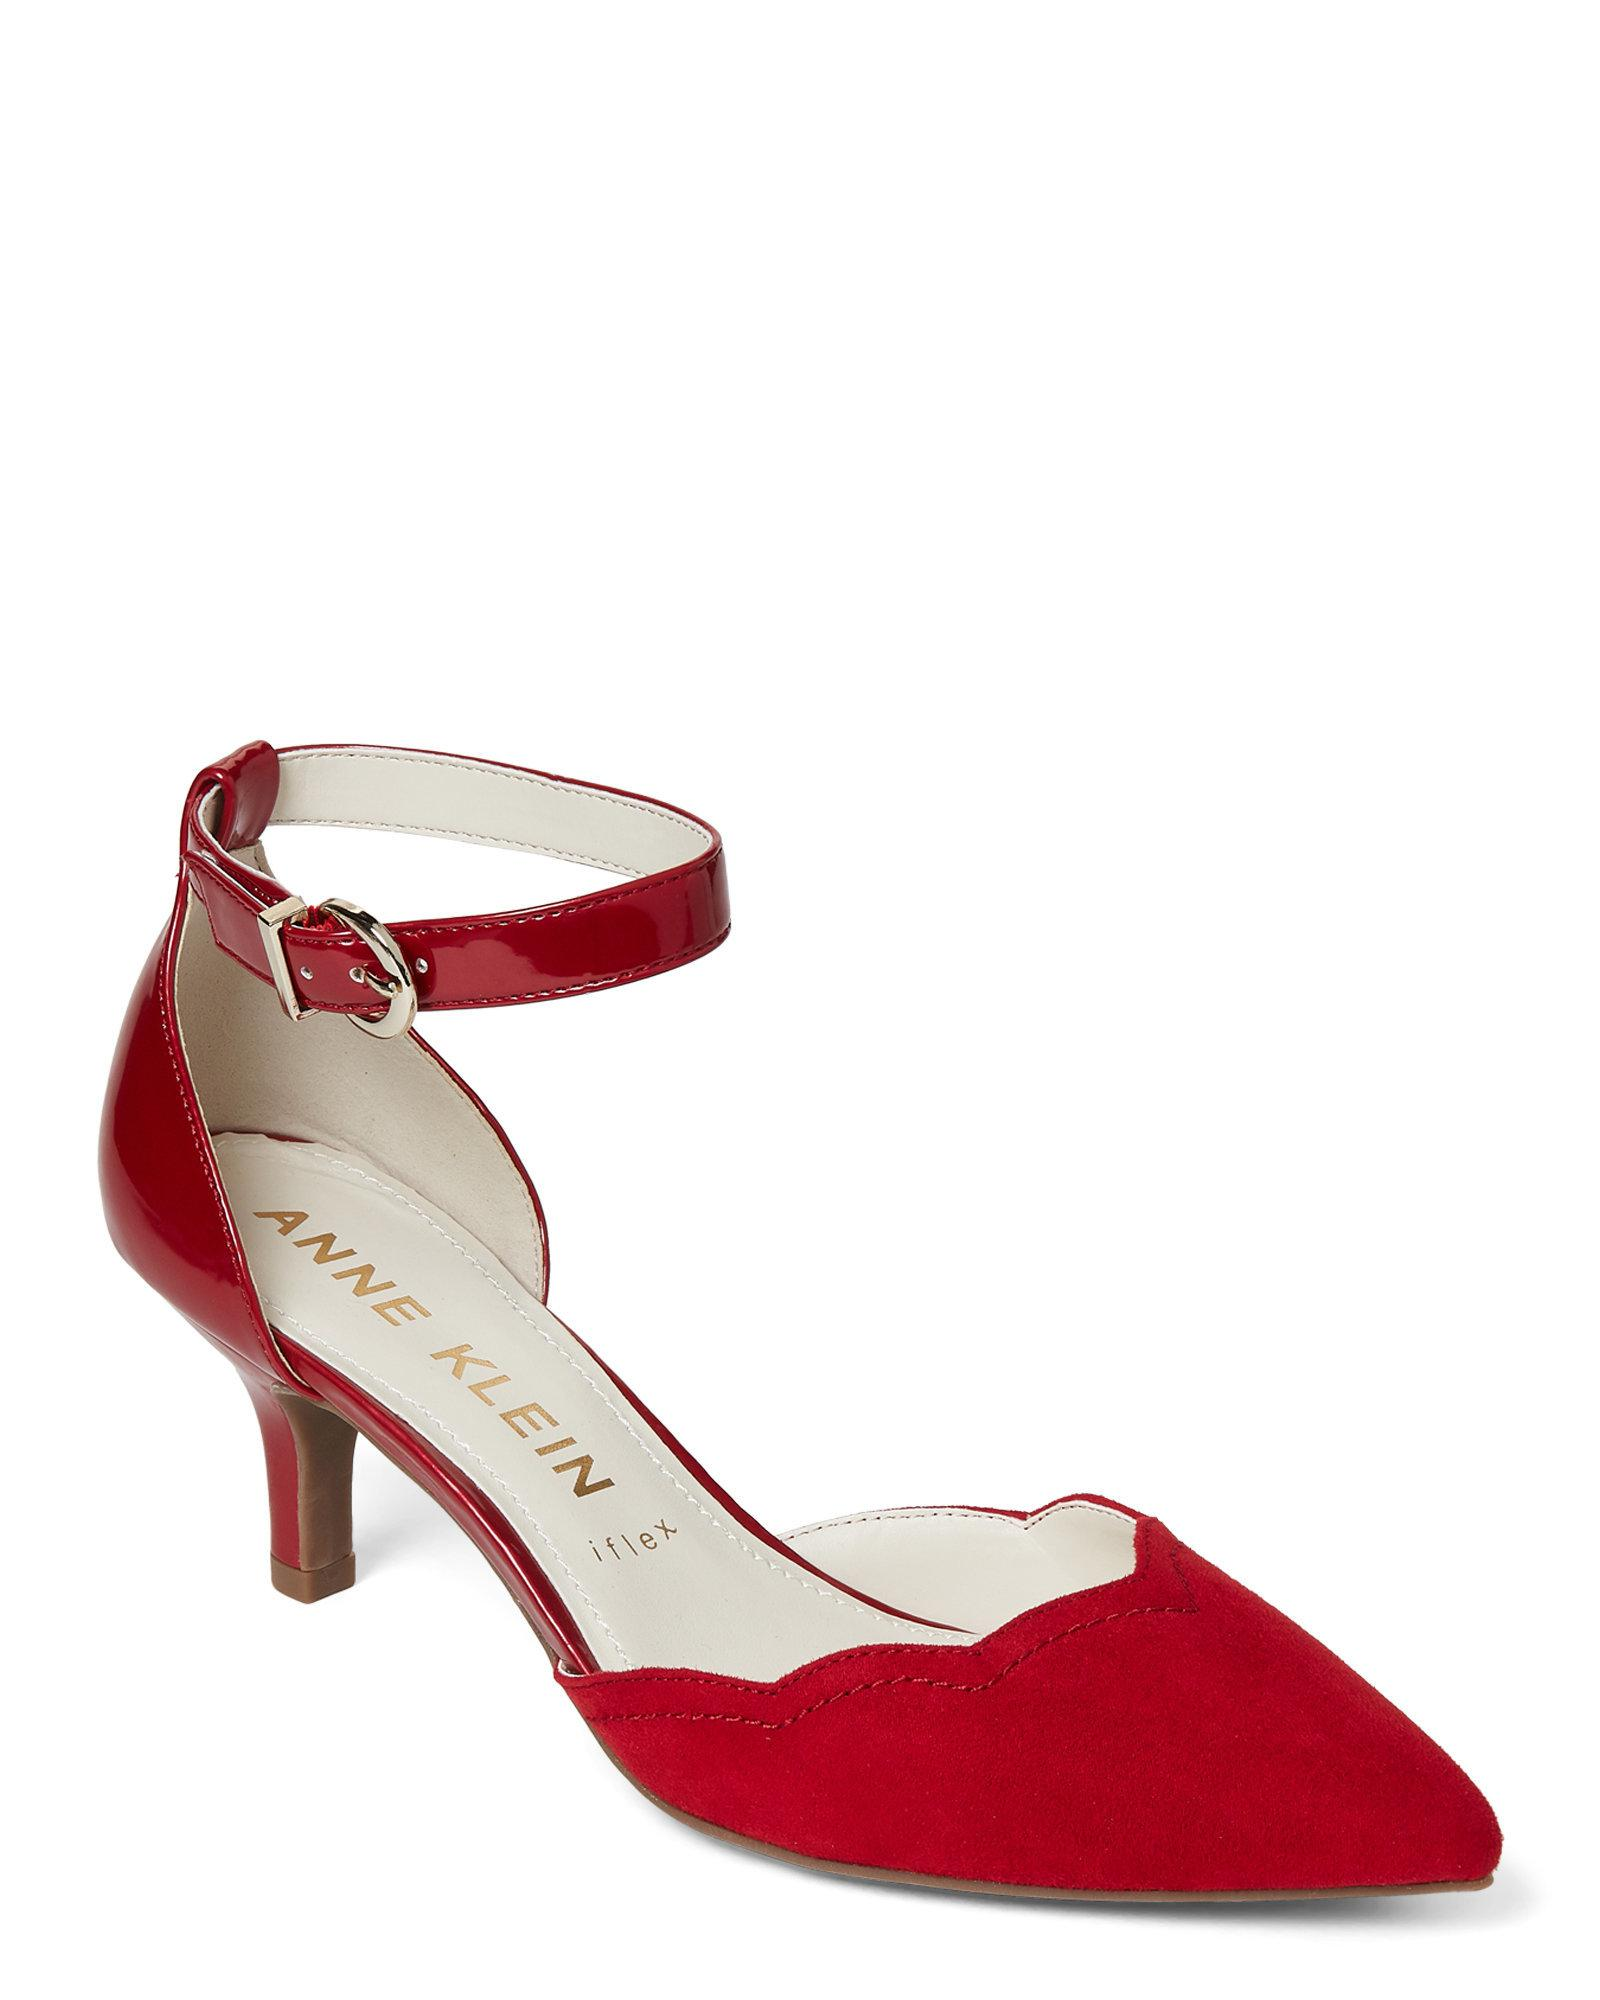 2e1cf43b281b Lyst - Anne Klein Red Ankle Strap Kitten Heel Pumps in Red